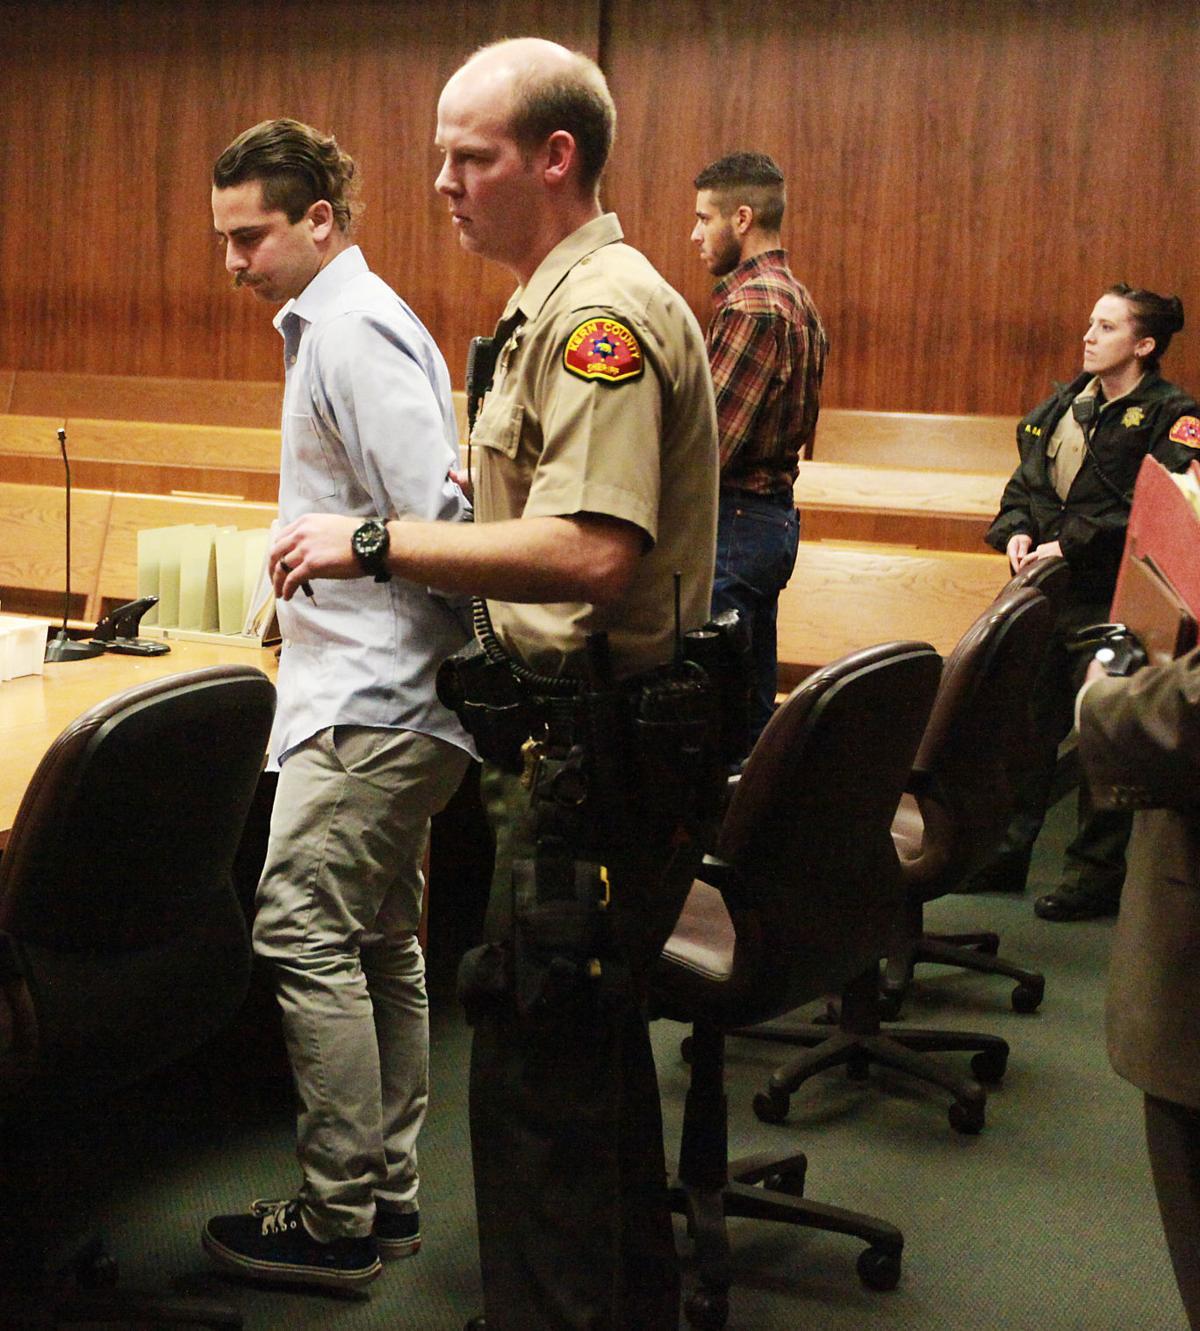 Two Sentenced In Hit-and-run That Killed Tehachapi Teen